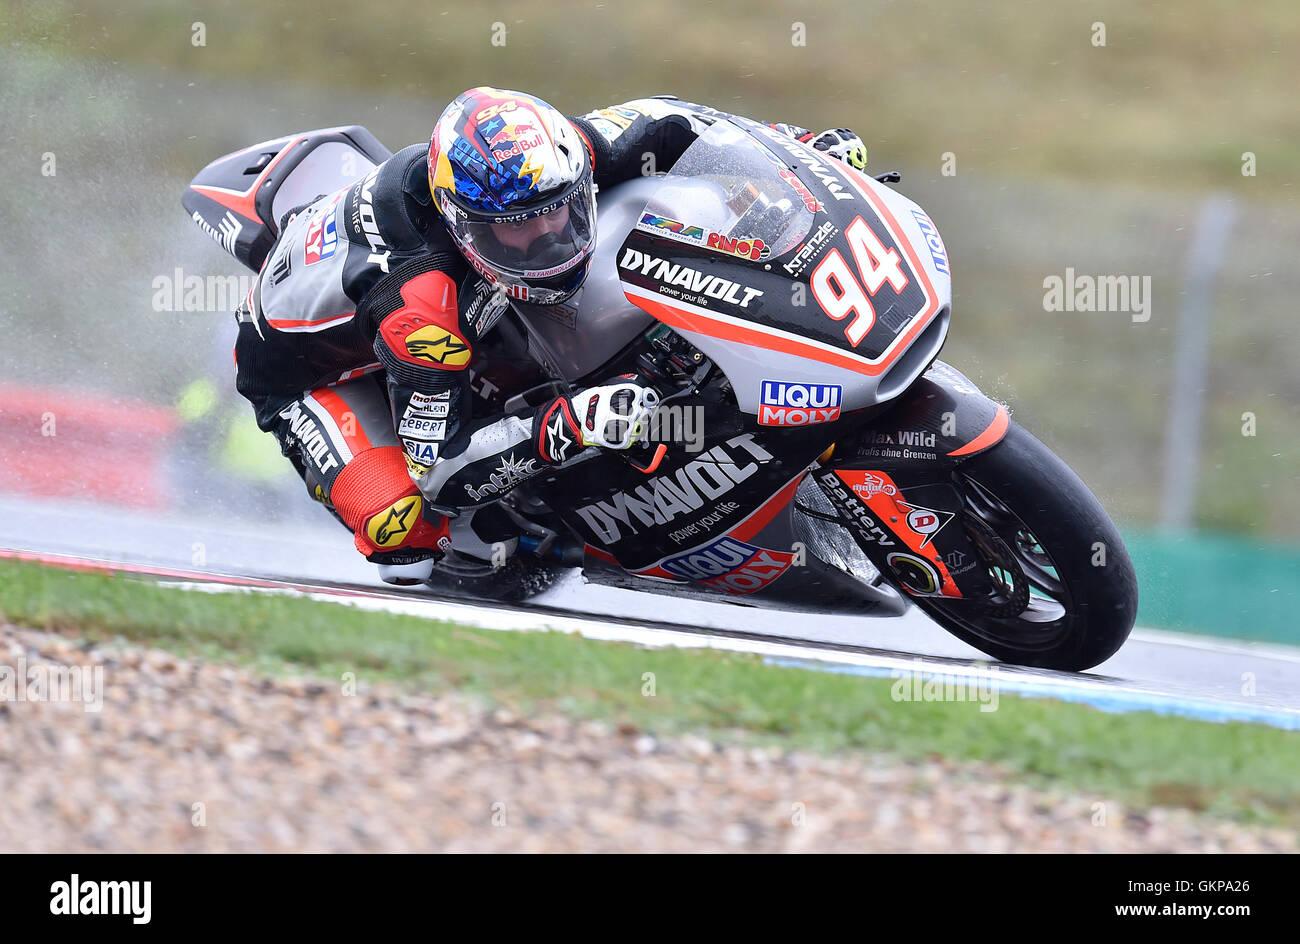 Brno, Czech Republic. 21st Aug, 2016. Grand Prix of the Czech Republic 2016, Moto2, Brno, Czech Republic, August - Stock Image